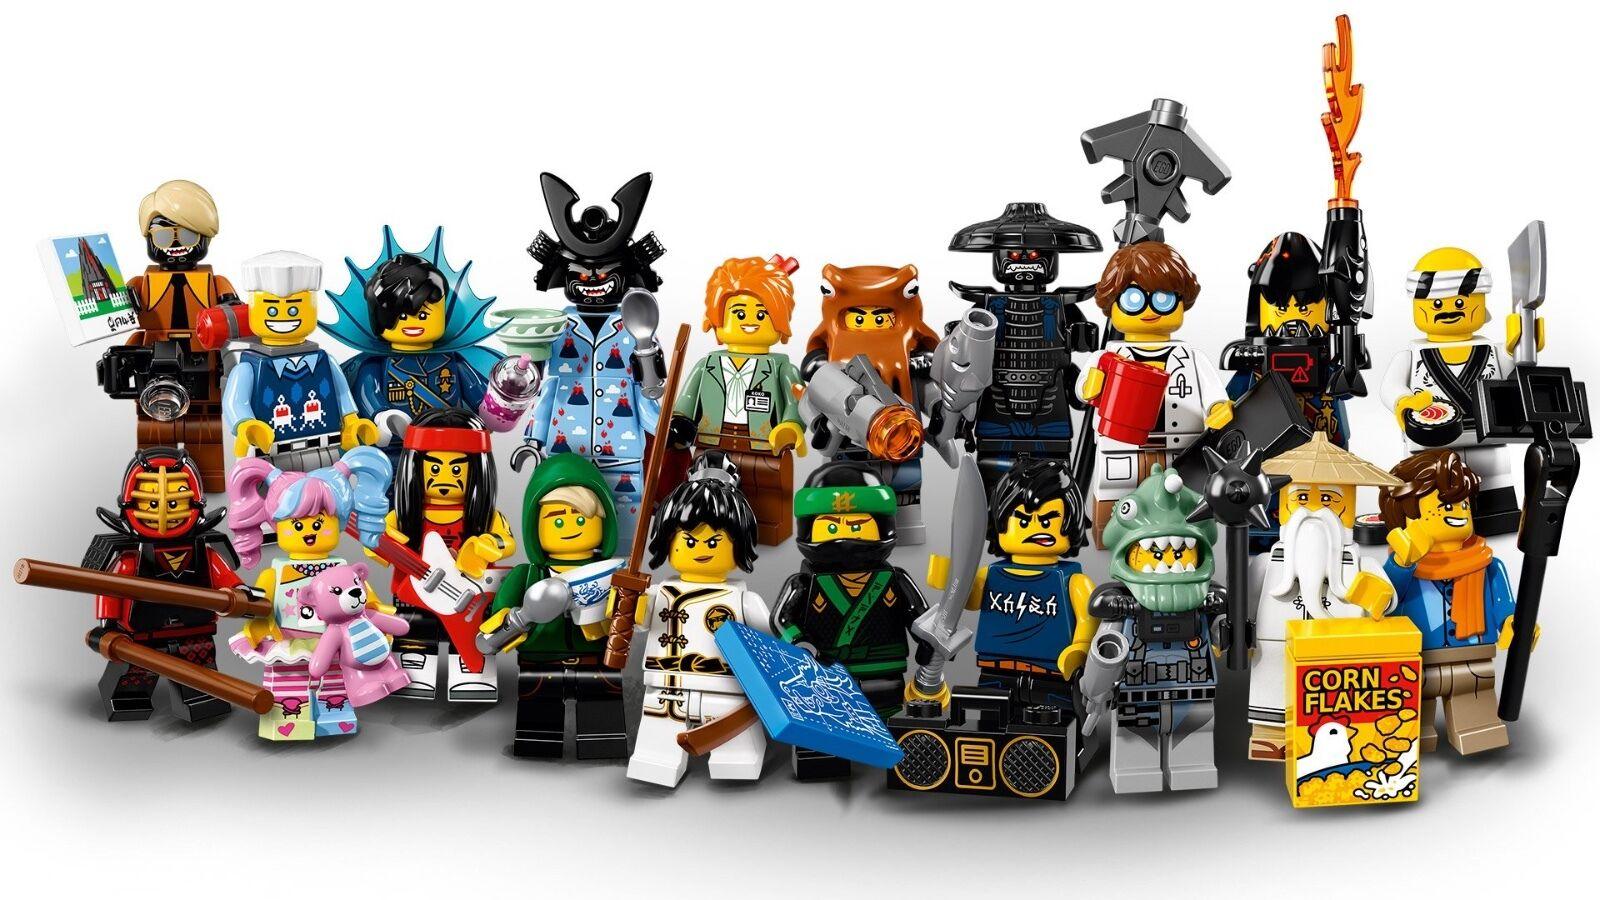 LEGO Ninjago Movie COMPLETE SET OF 20 MINIFIGURES SEALED 71019